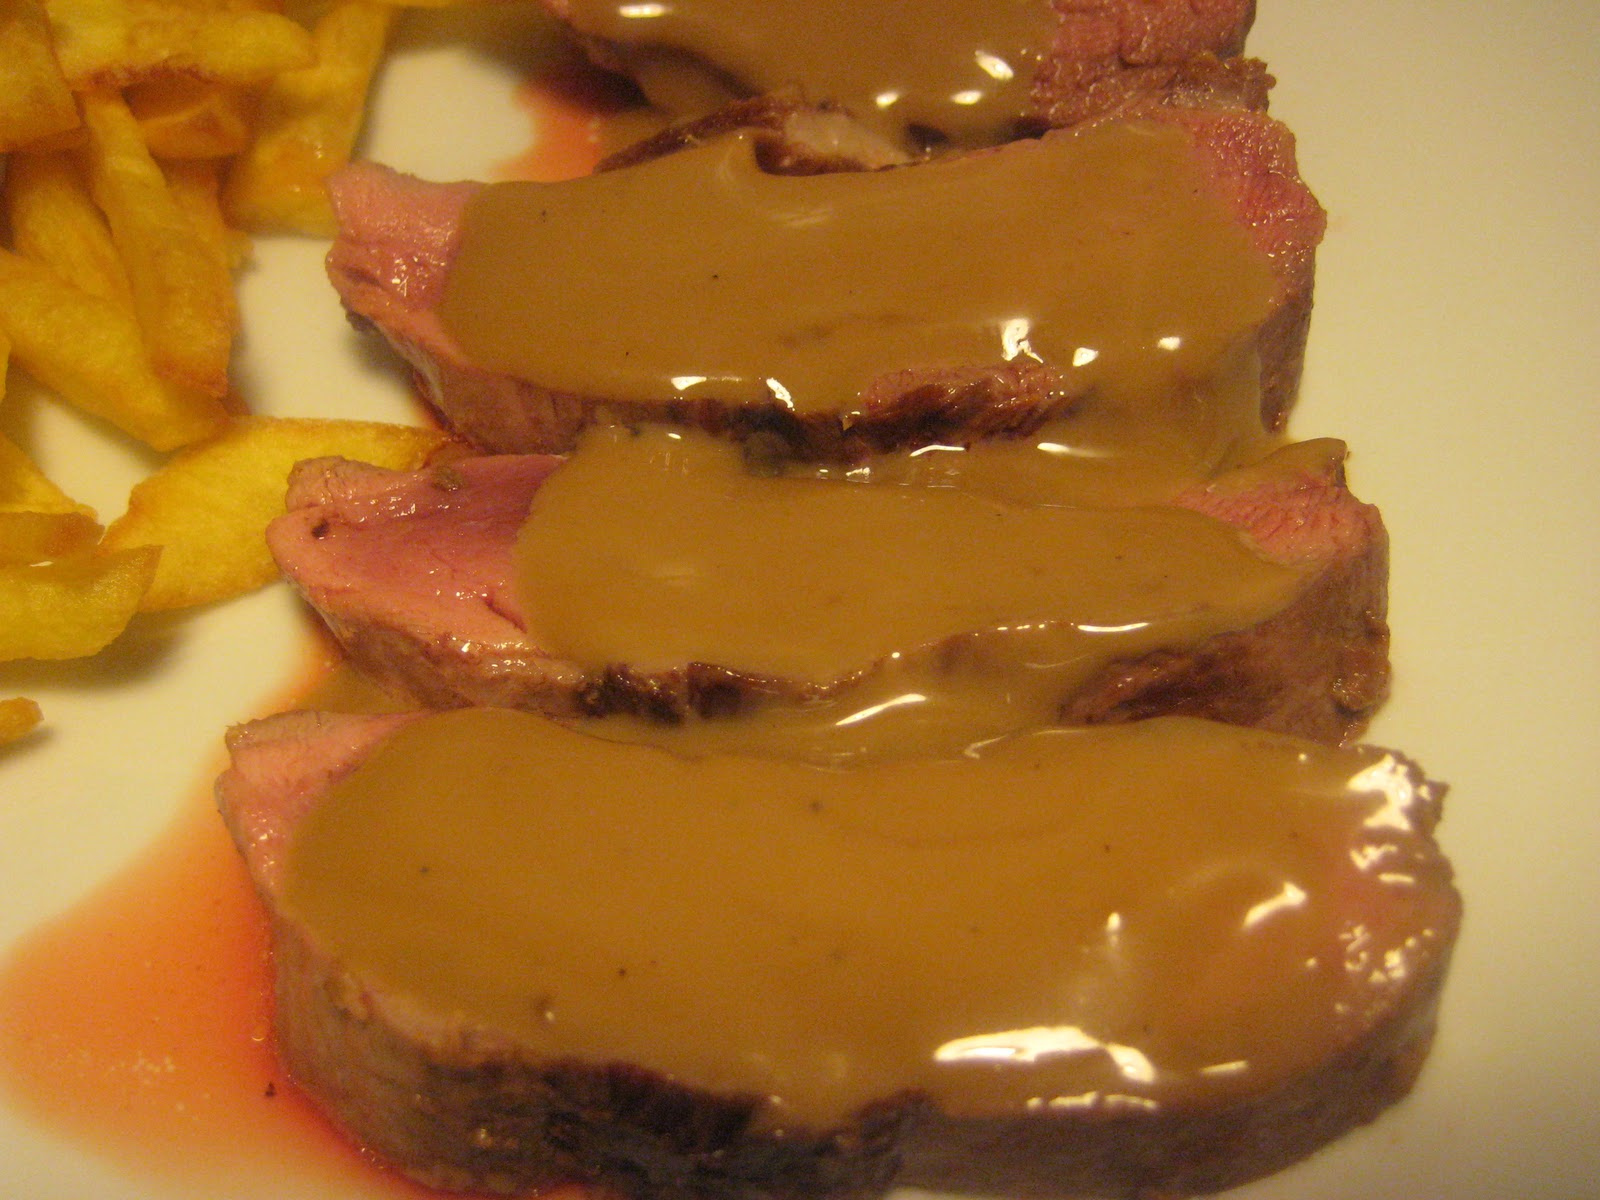 De mi cocina magret de pato con salsa al vino m laga for Mi cocina malaga